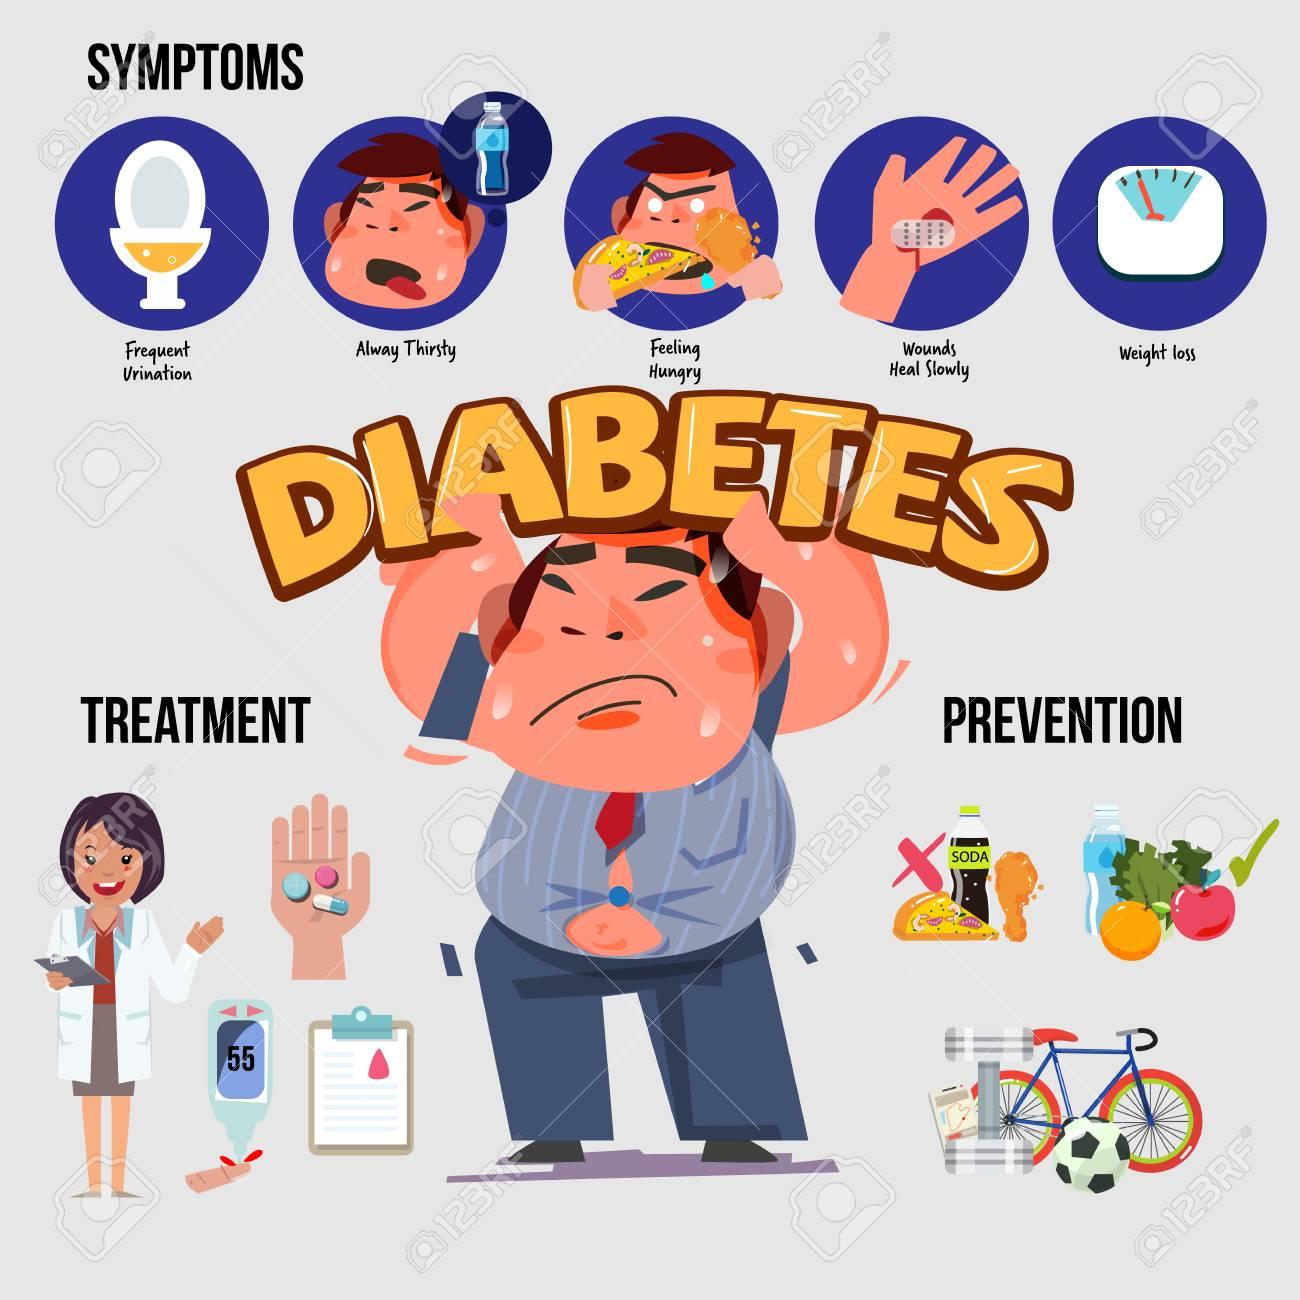 diabetes symptom, treatment or prevention infographic - vector illustration - 118379601